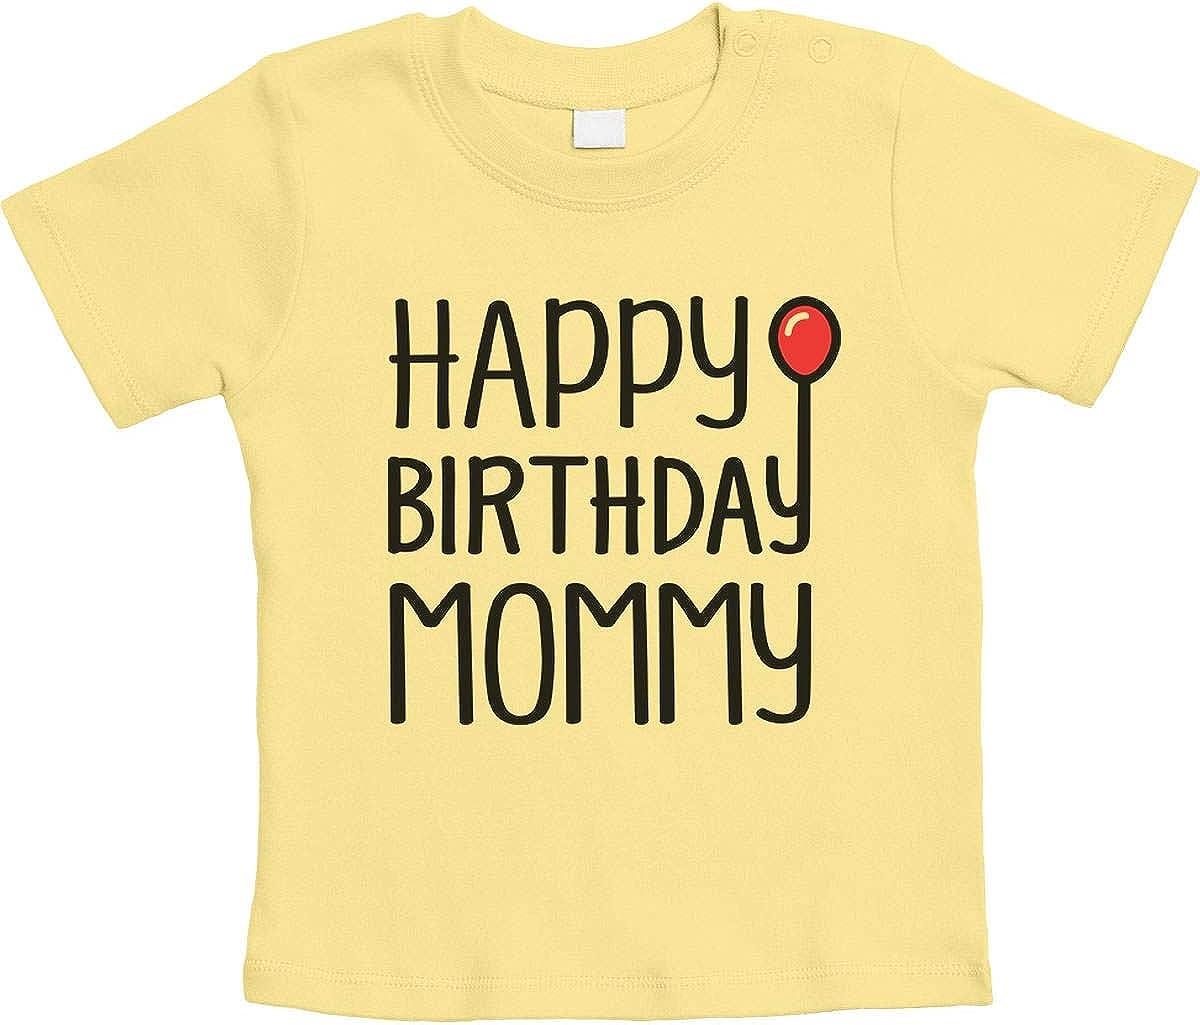 Happy Birthday Mommy Present Red Balloon Unisex Baby T-Shirt Gr 66-93